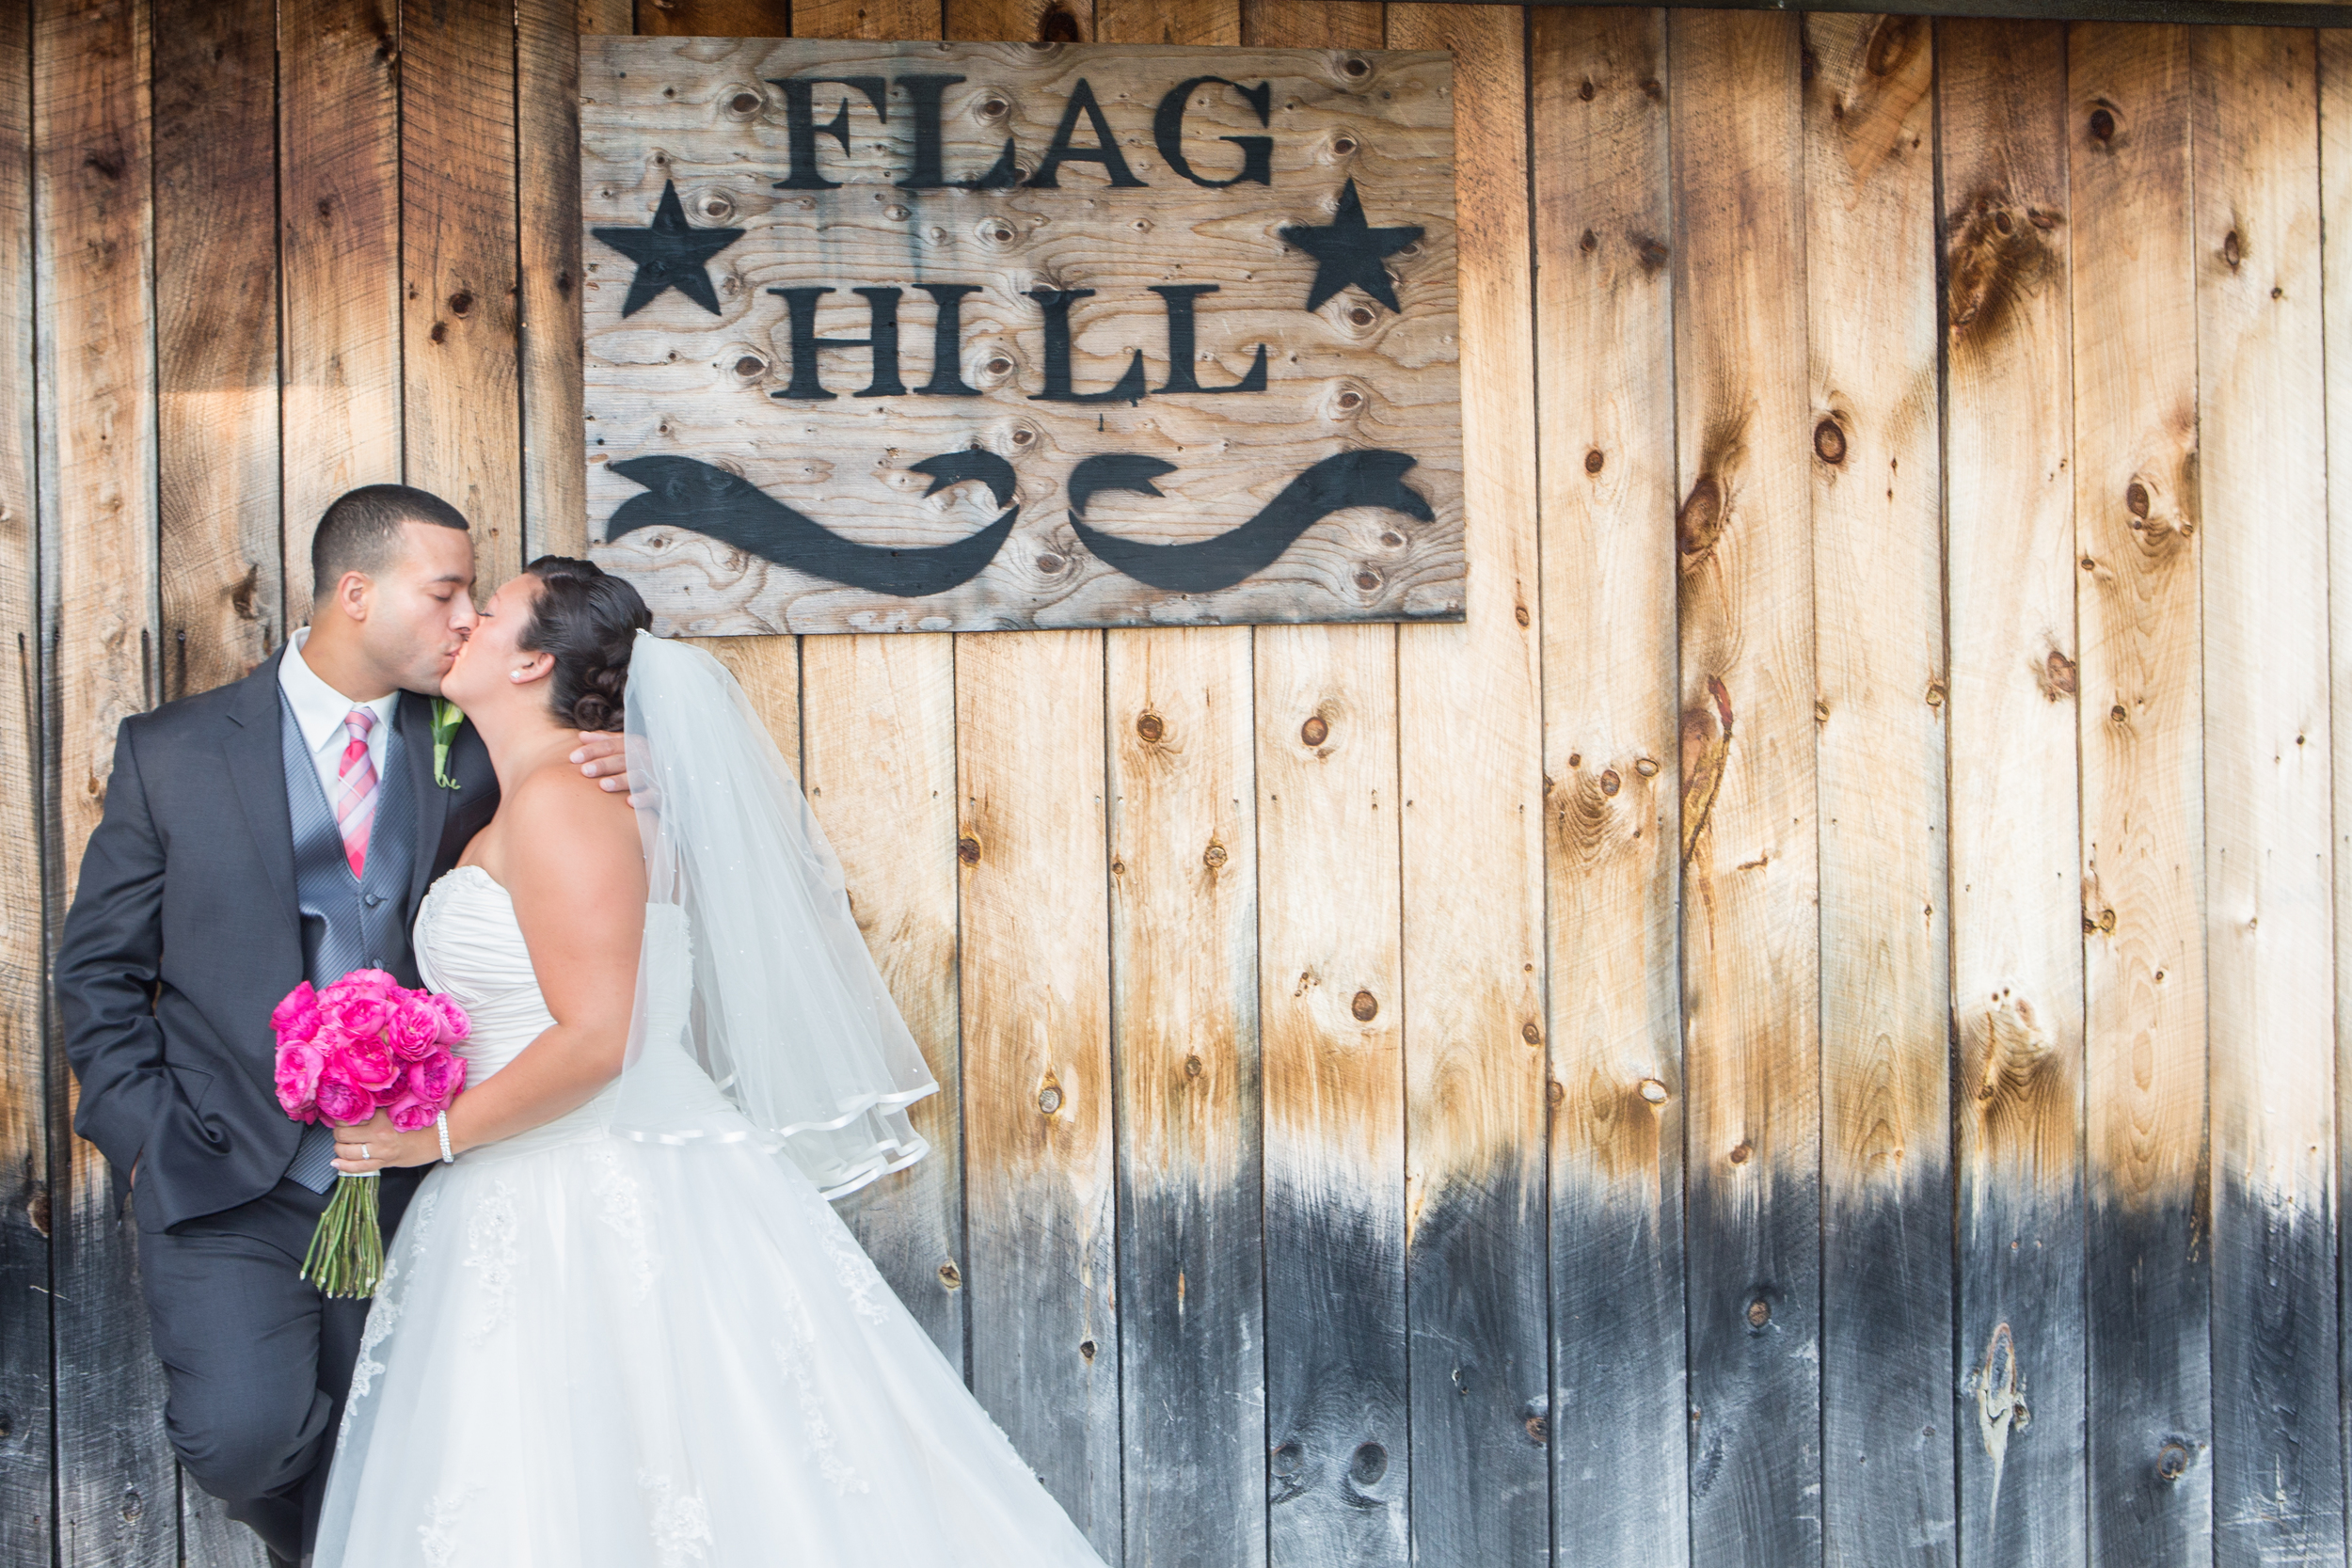 Salem MA wedding photographer